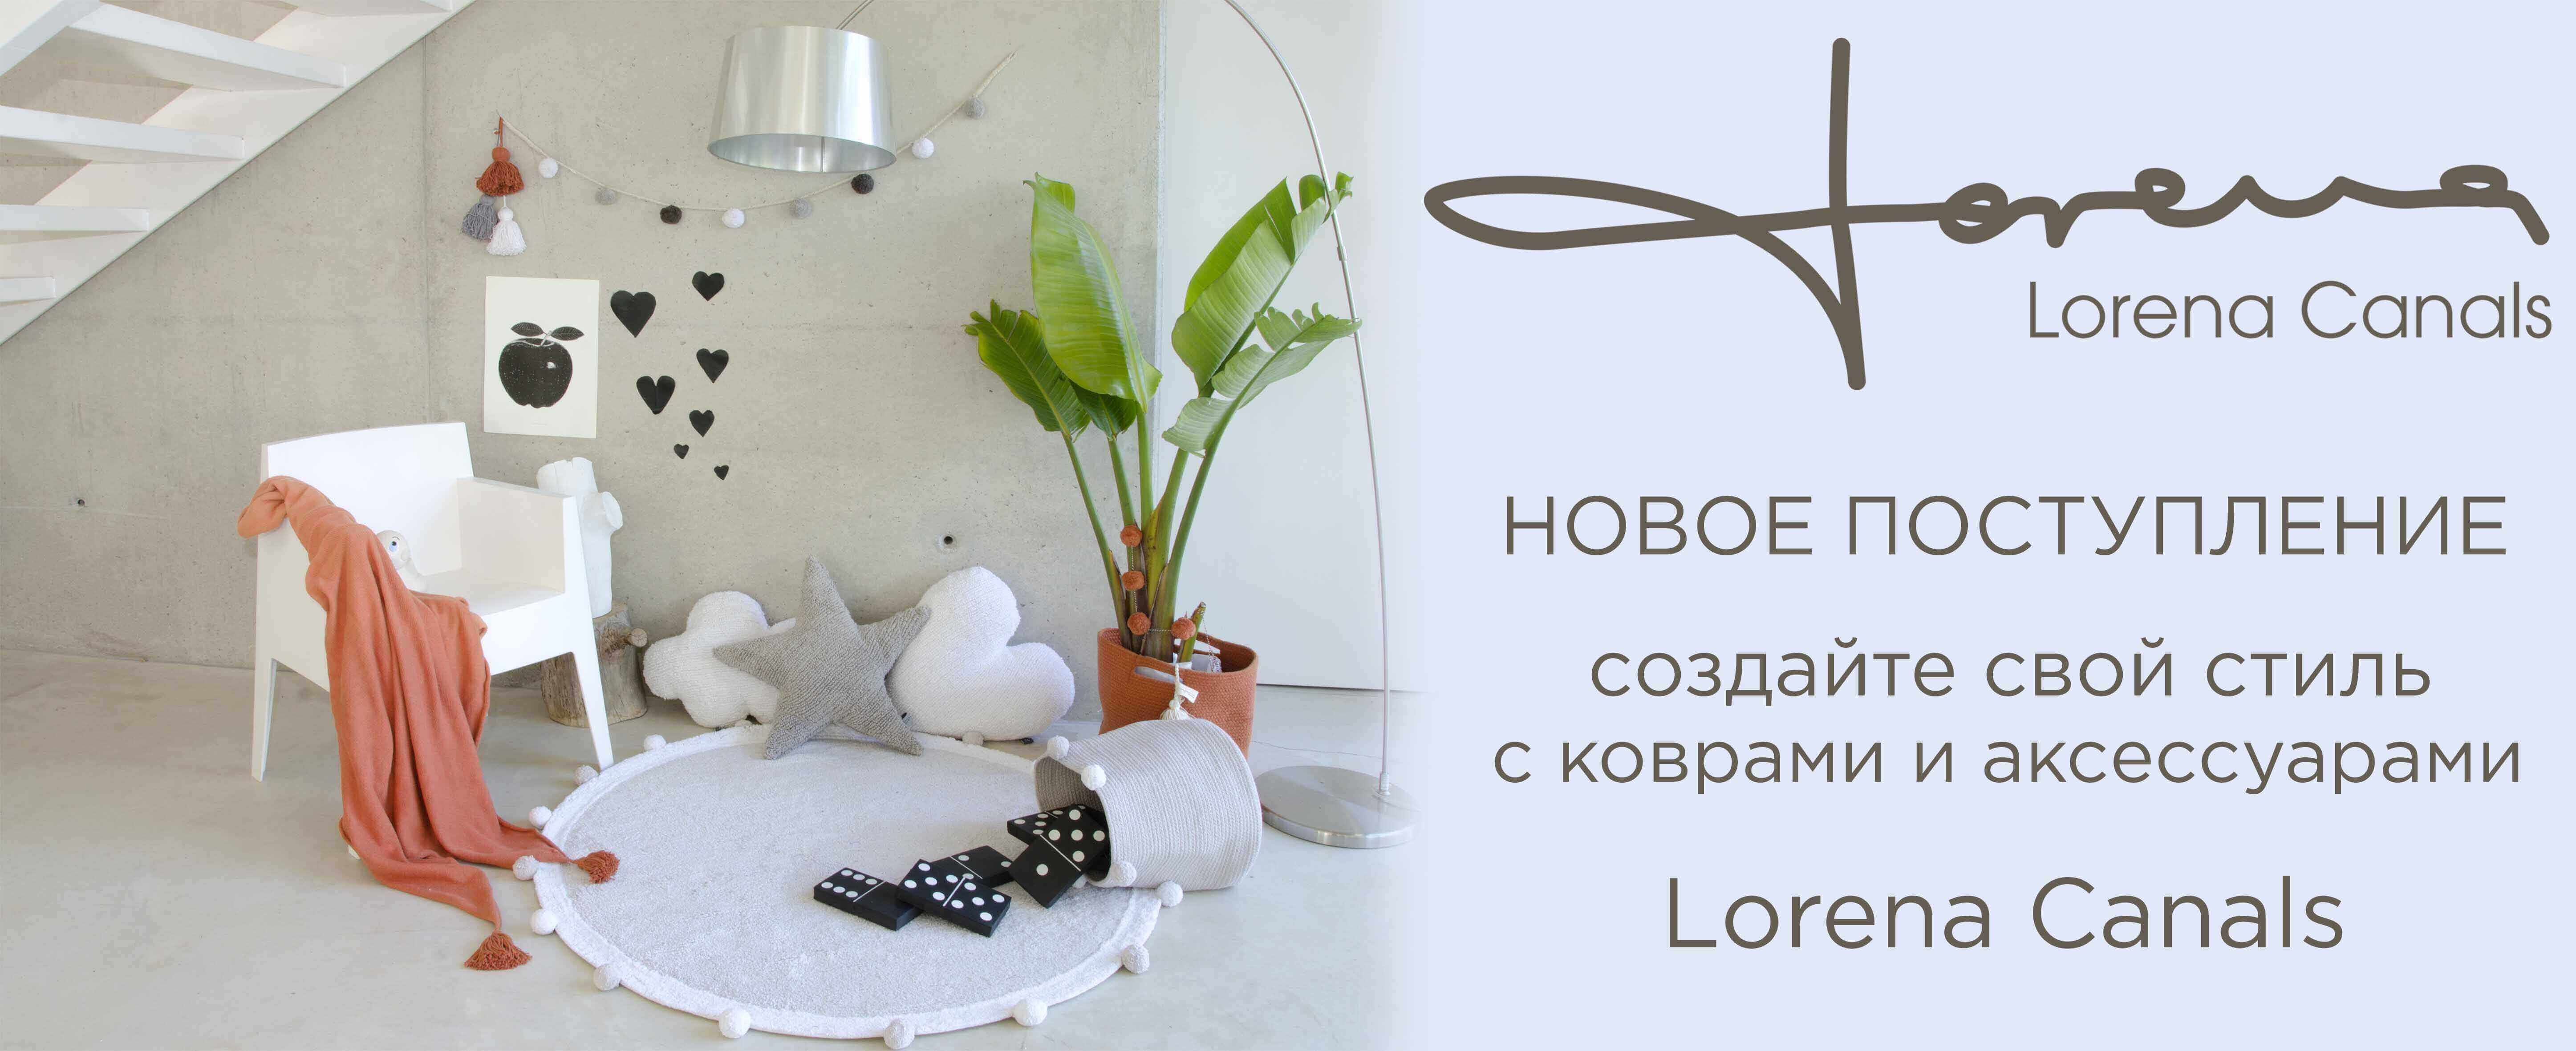 lorena3